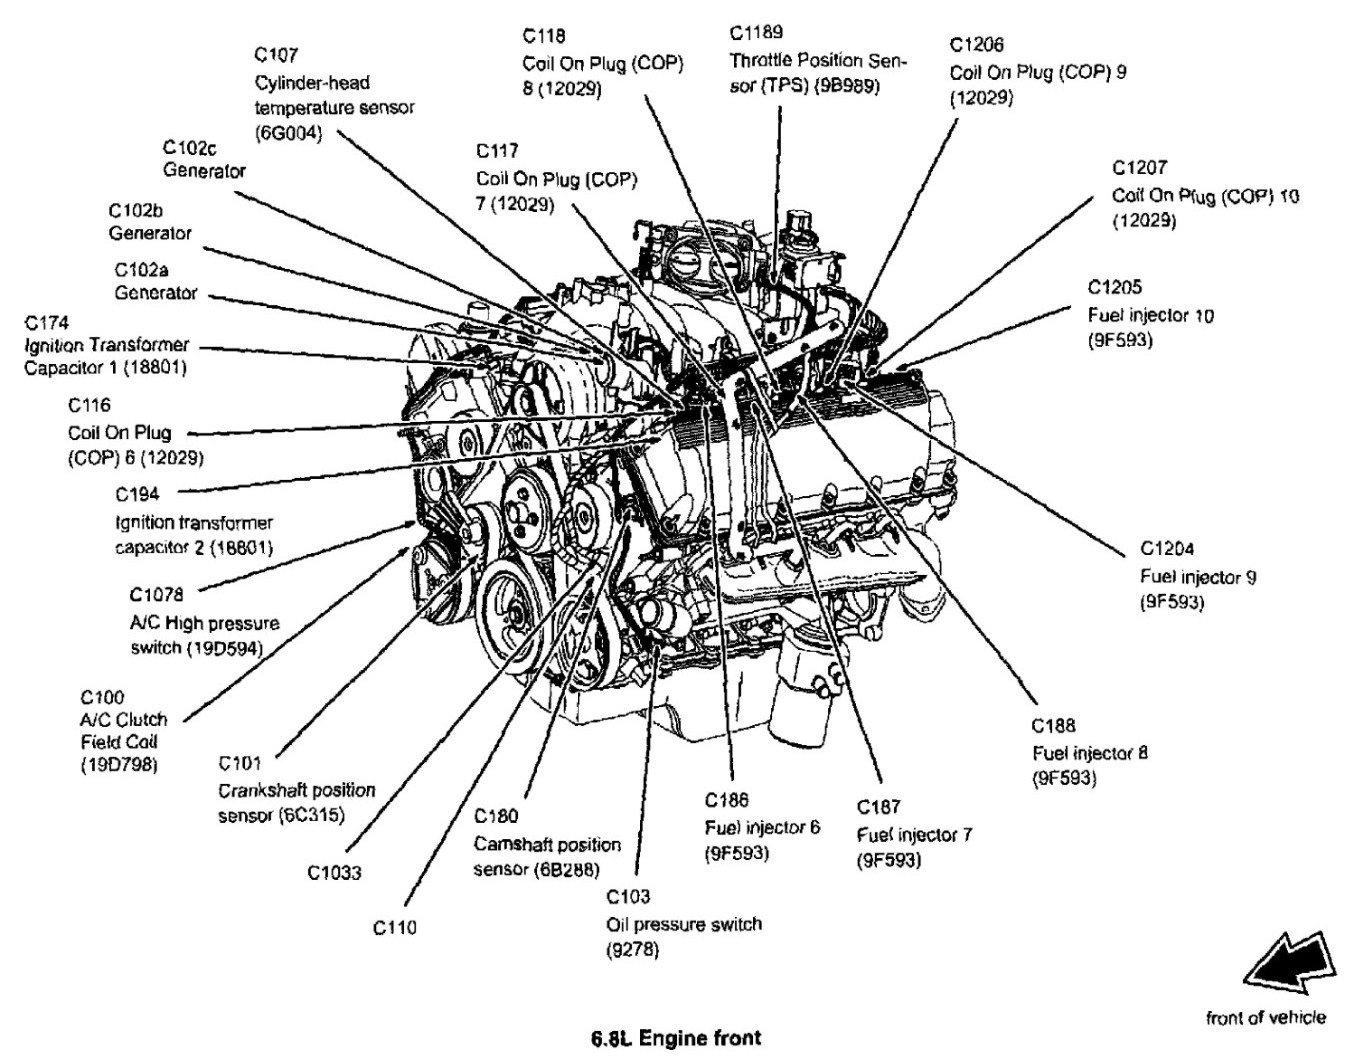 1999 Ford V10 Engine Diagram Full Hd Version Engine Diagram